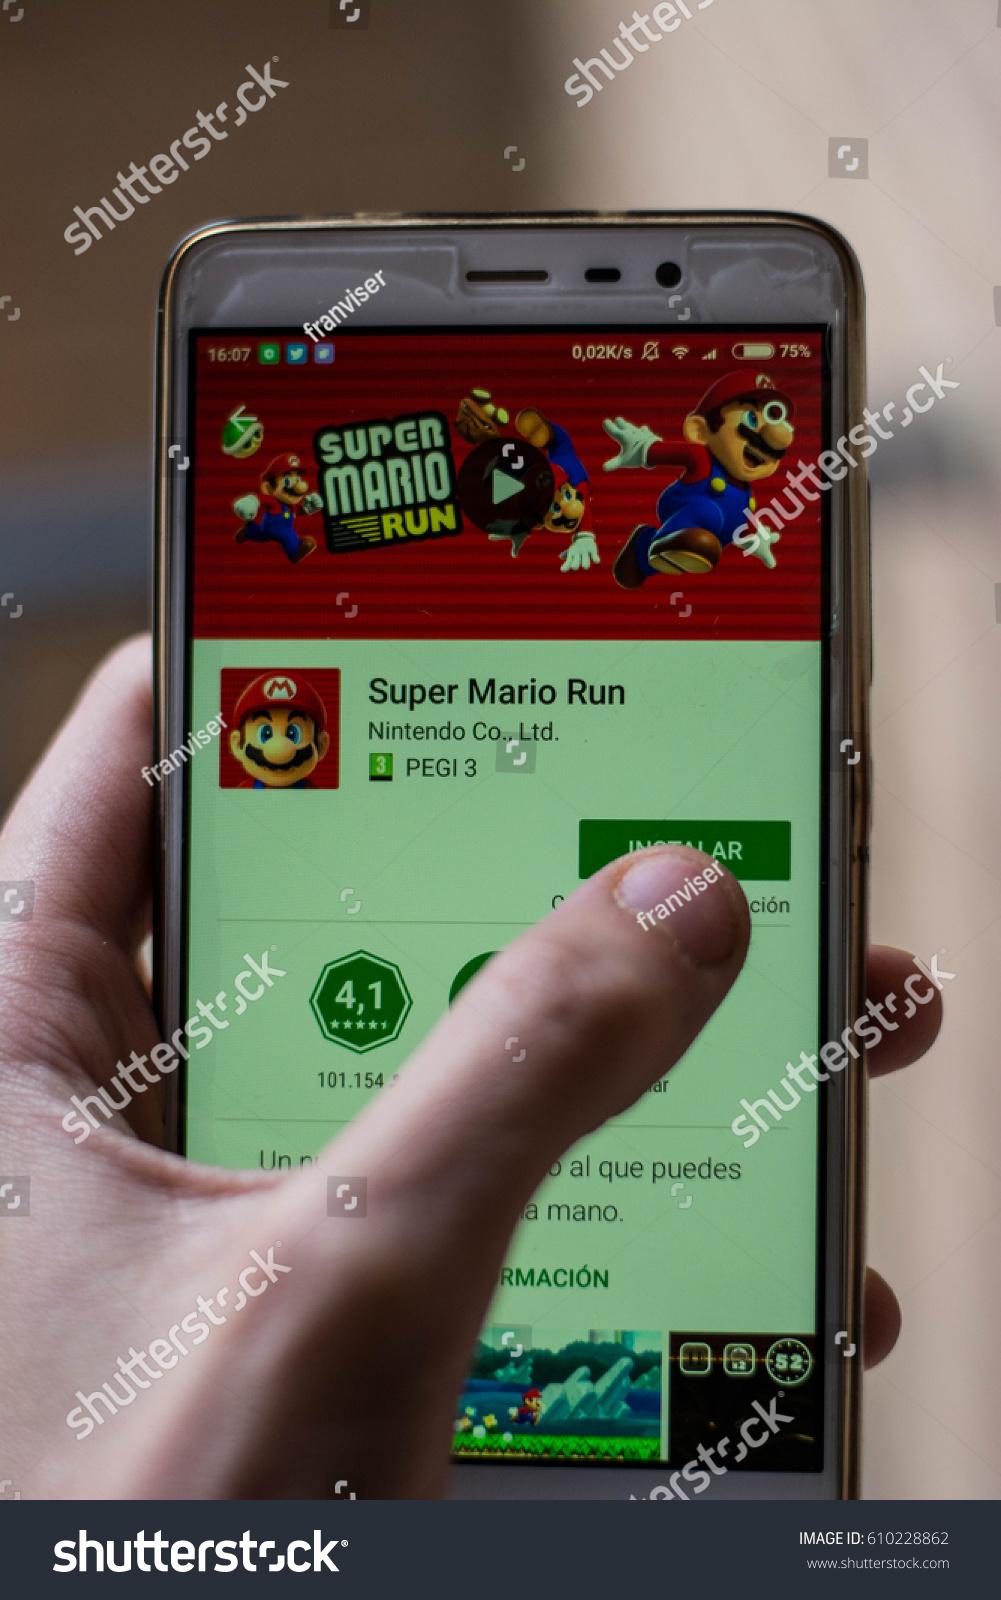 Super Mario Run New Game Mobile Stock Photo (Edit Now) 610228862